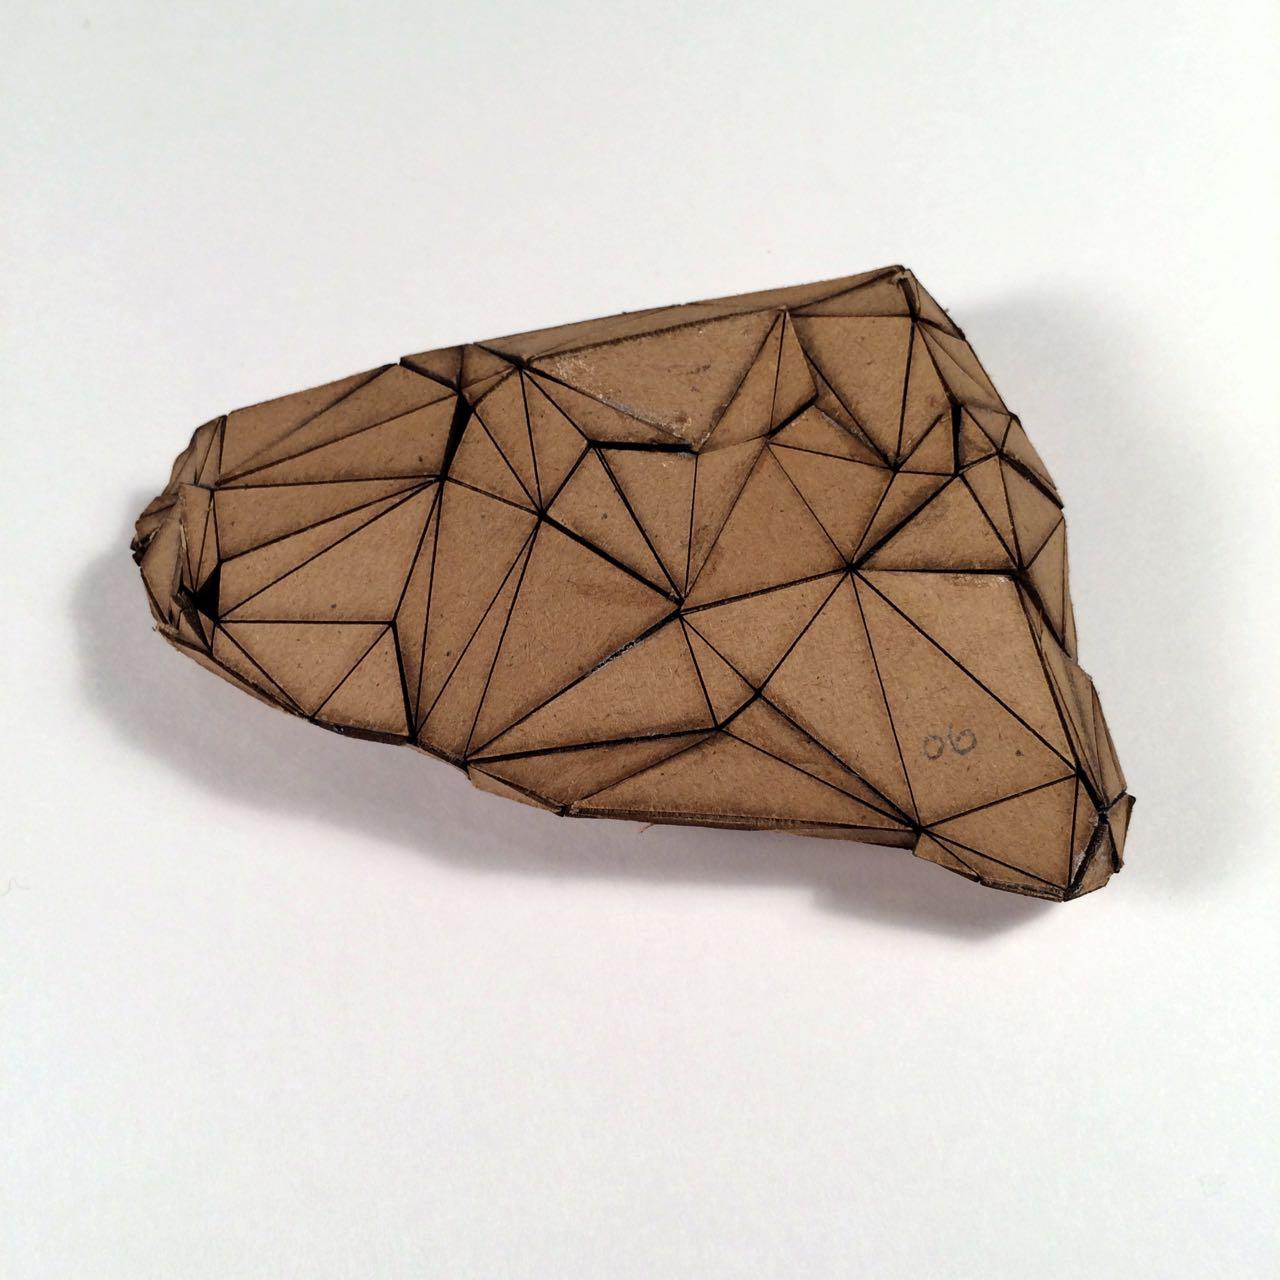 (Front view) 006 - Boxes For Rocks, laser cut cardboard, found rocks, glue, 12cm x 8.5cm x 3cm (flatish), 2012, 250 CAD